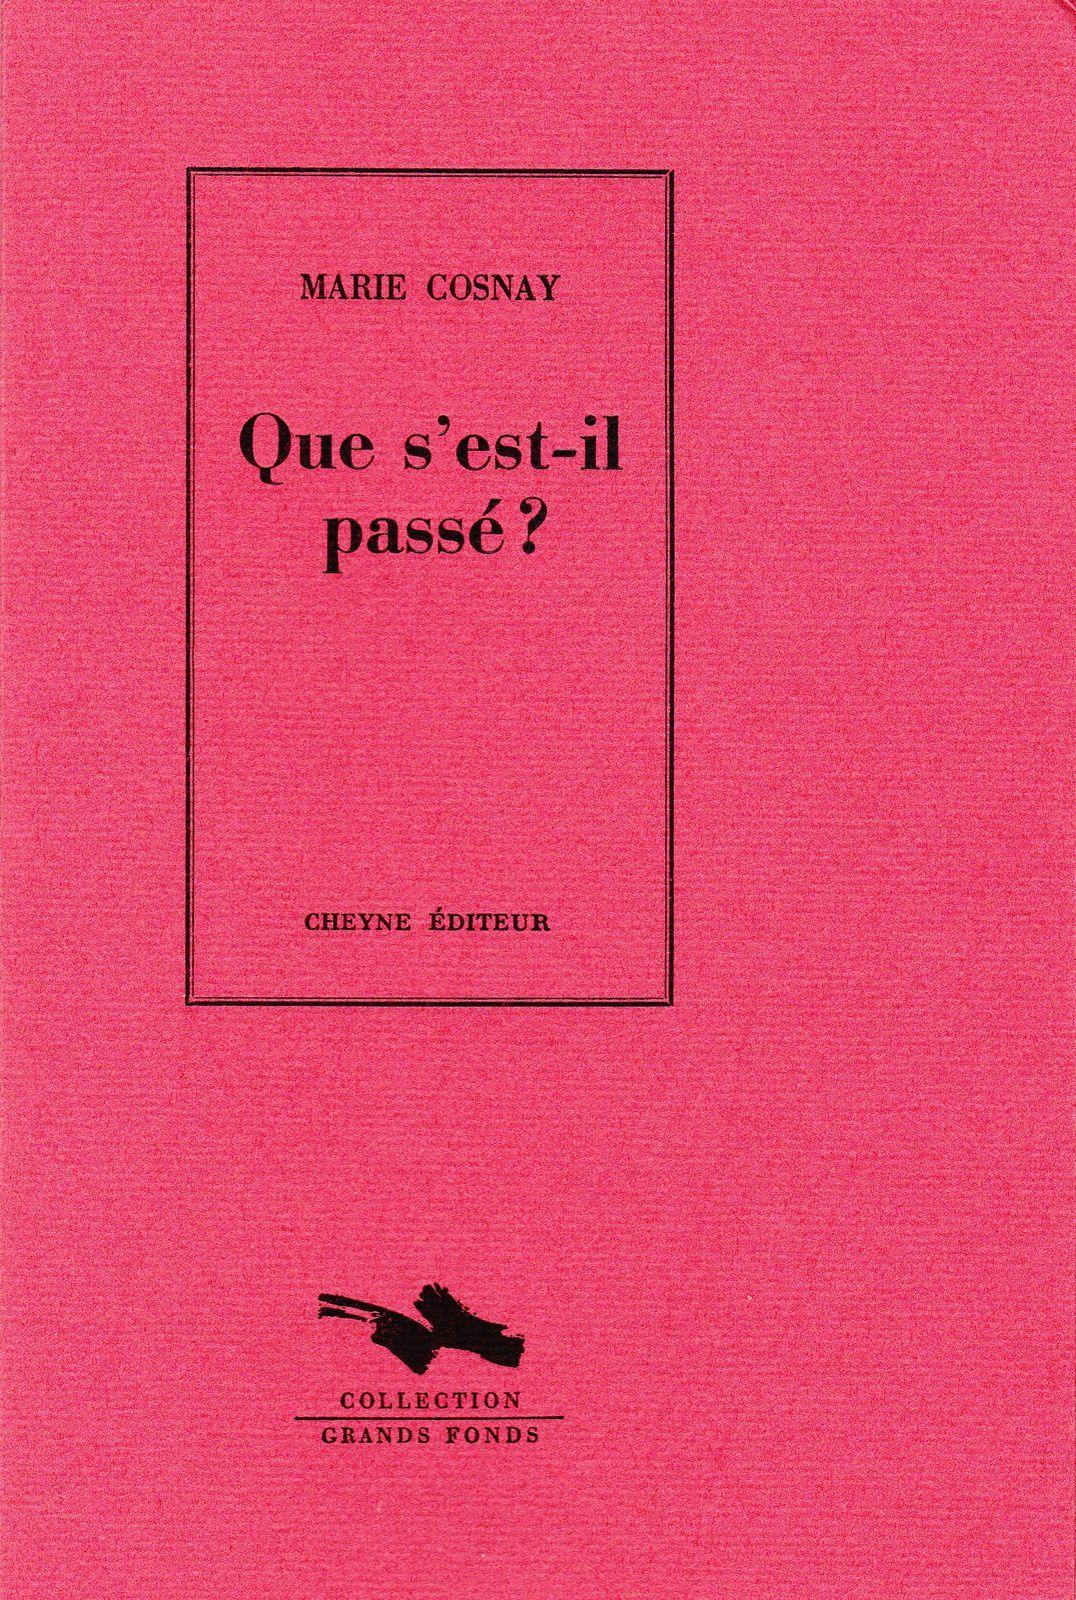 Voix d'aujourd'hui 1 - Marie Cosnay